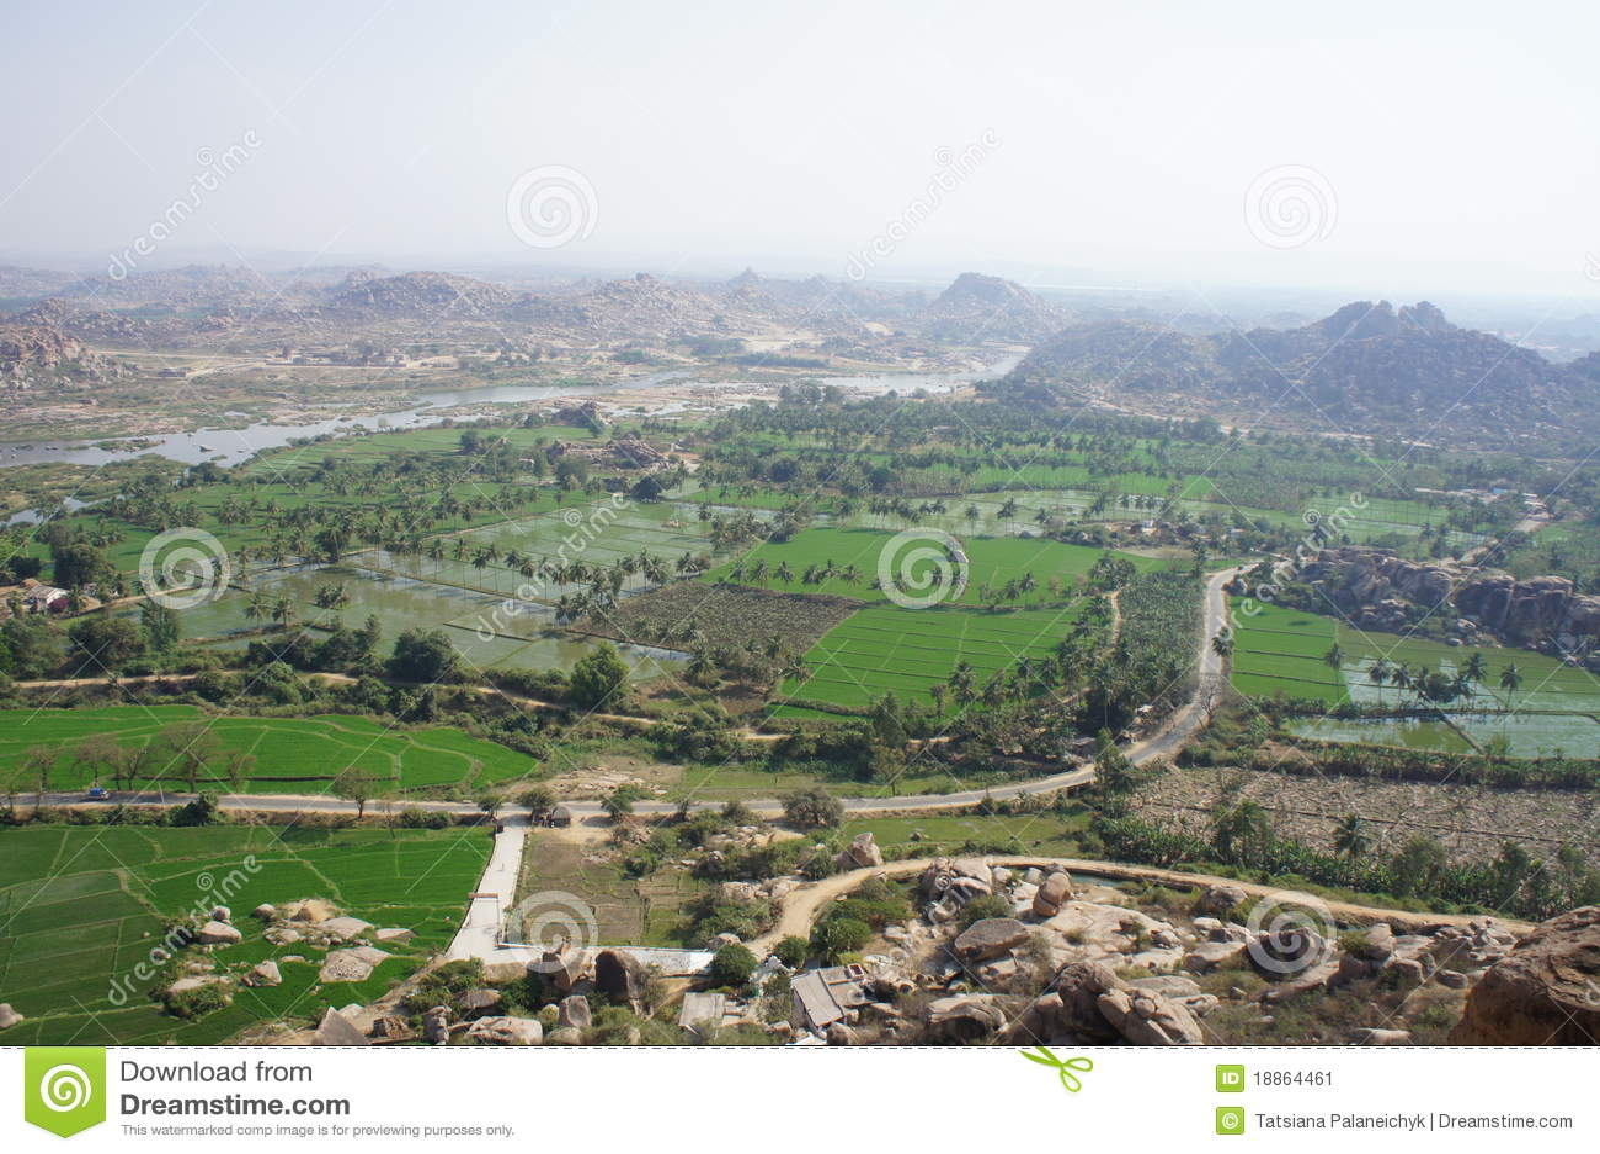 The Indian landscape